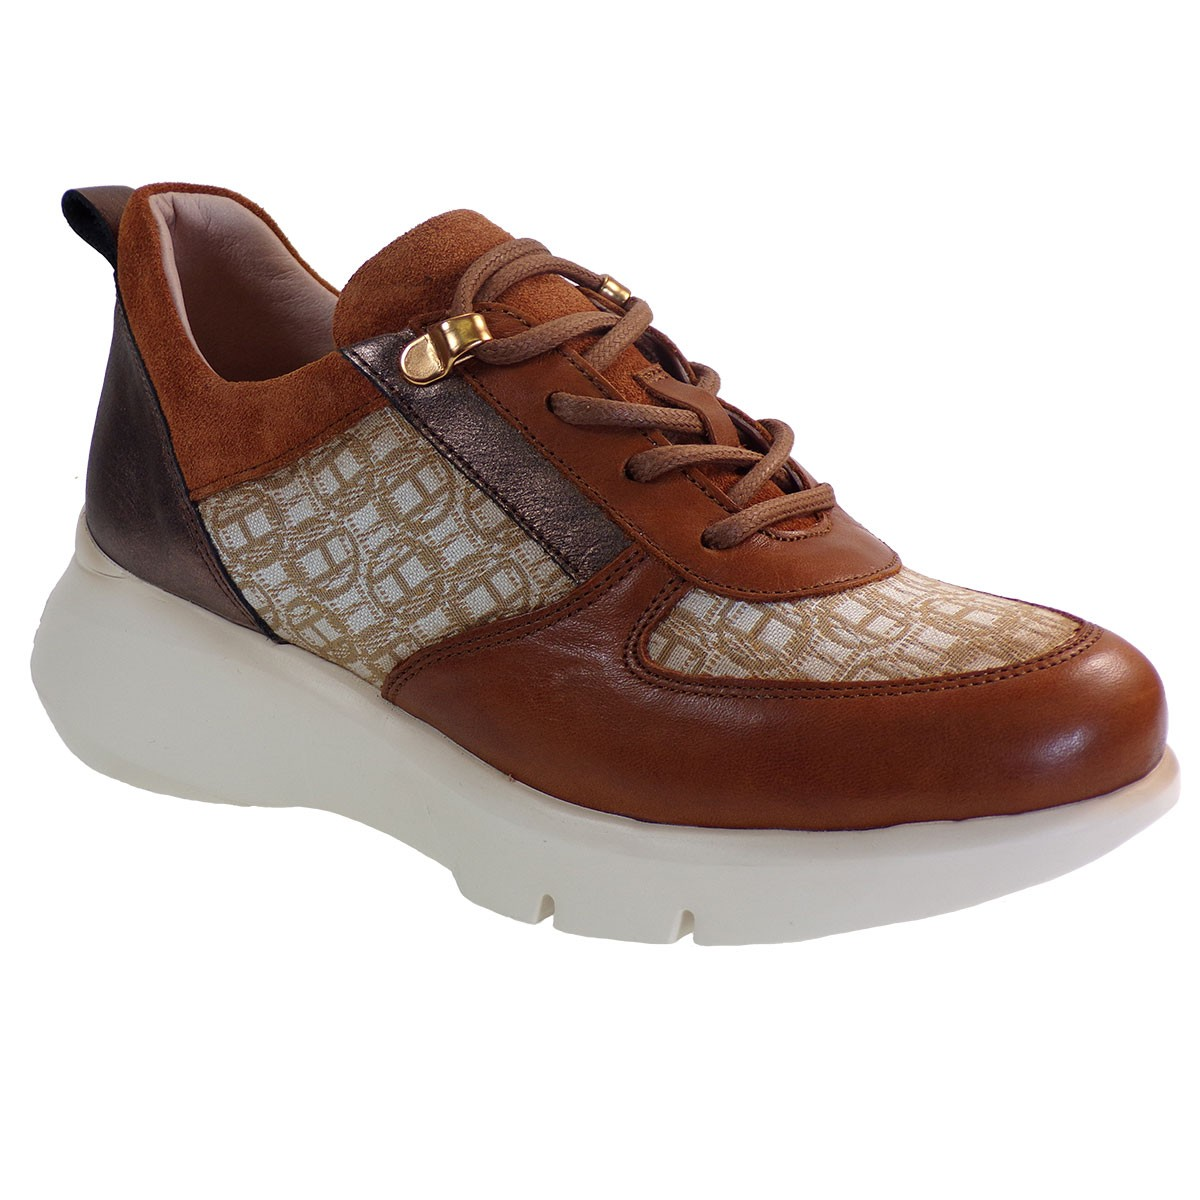 Hispanitas Γυναικεία Sneakers Αθλητικό HI00603 Ταμπά Δέρμα